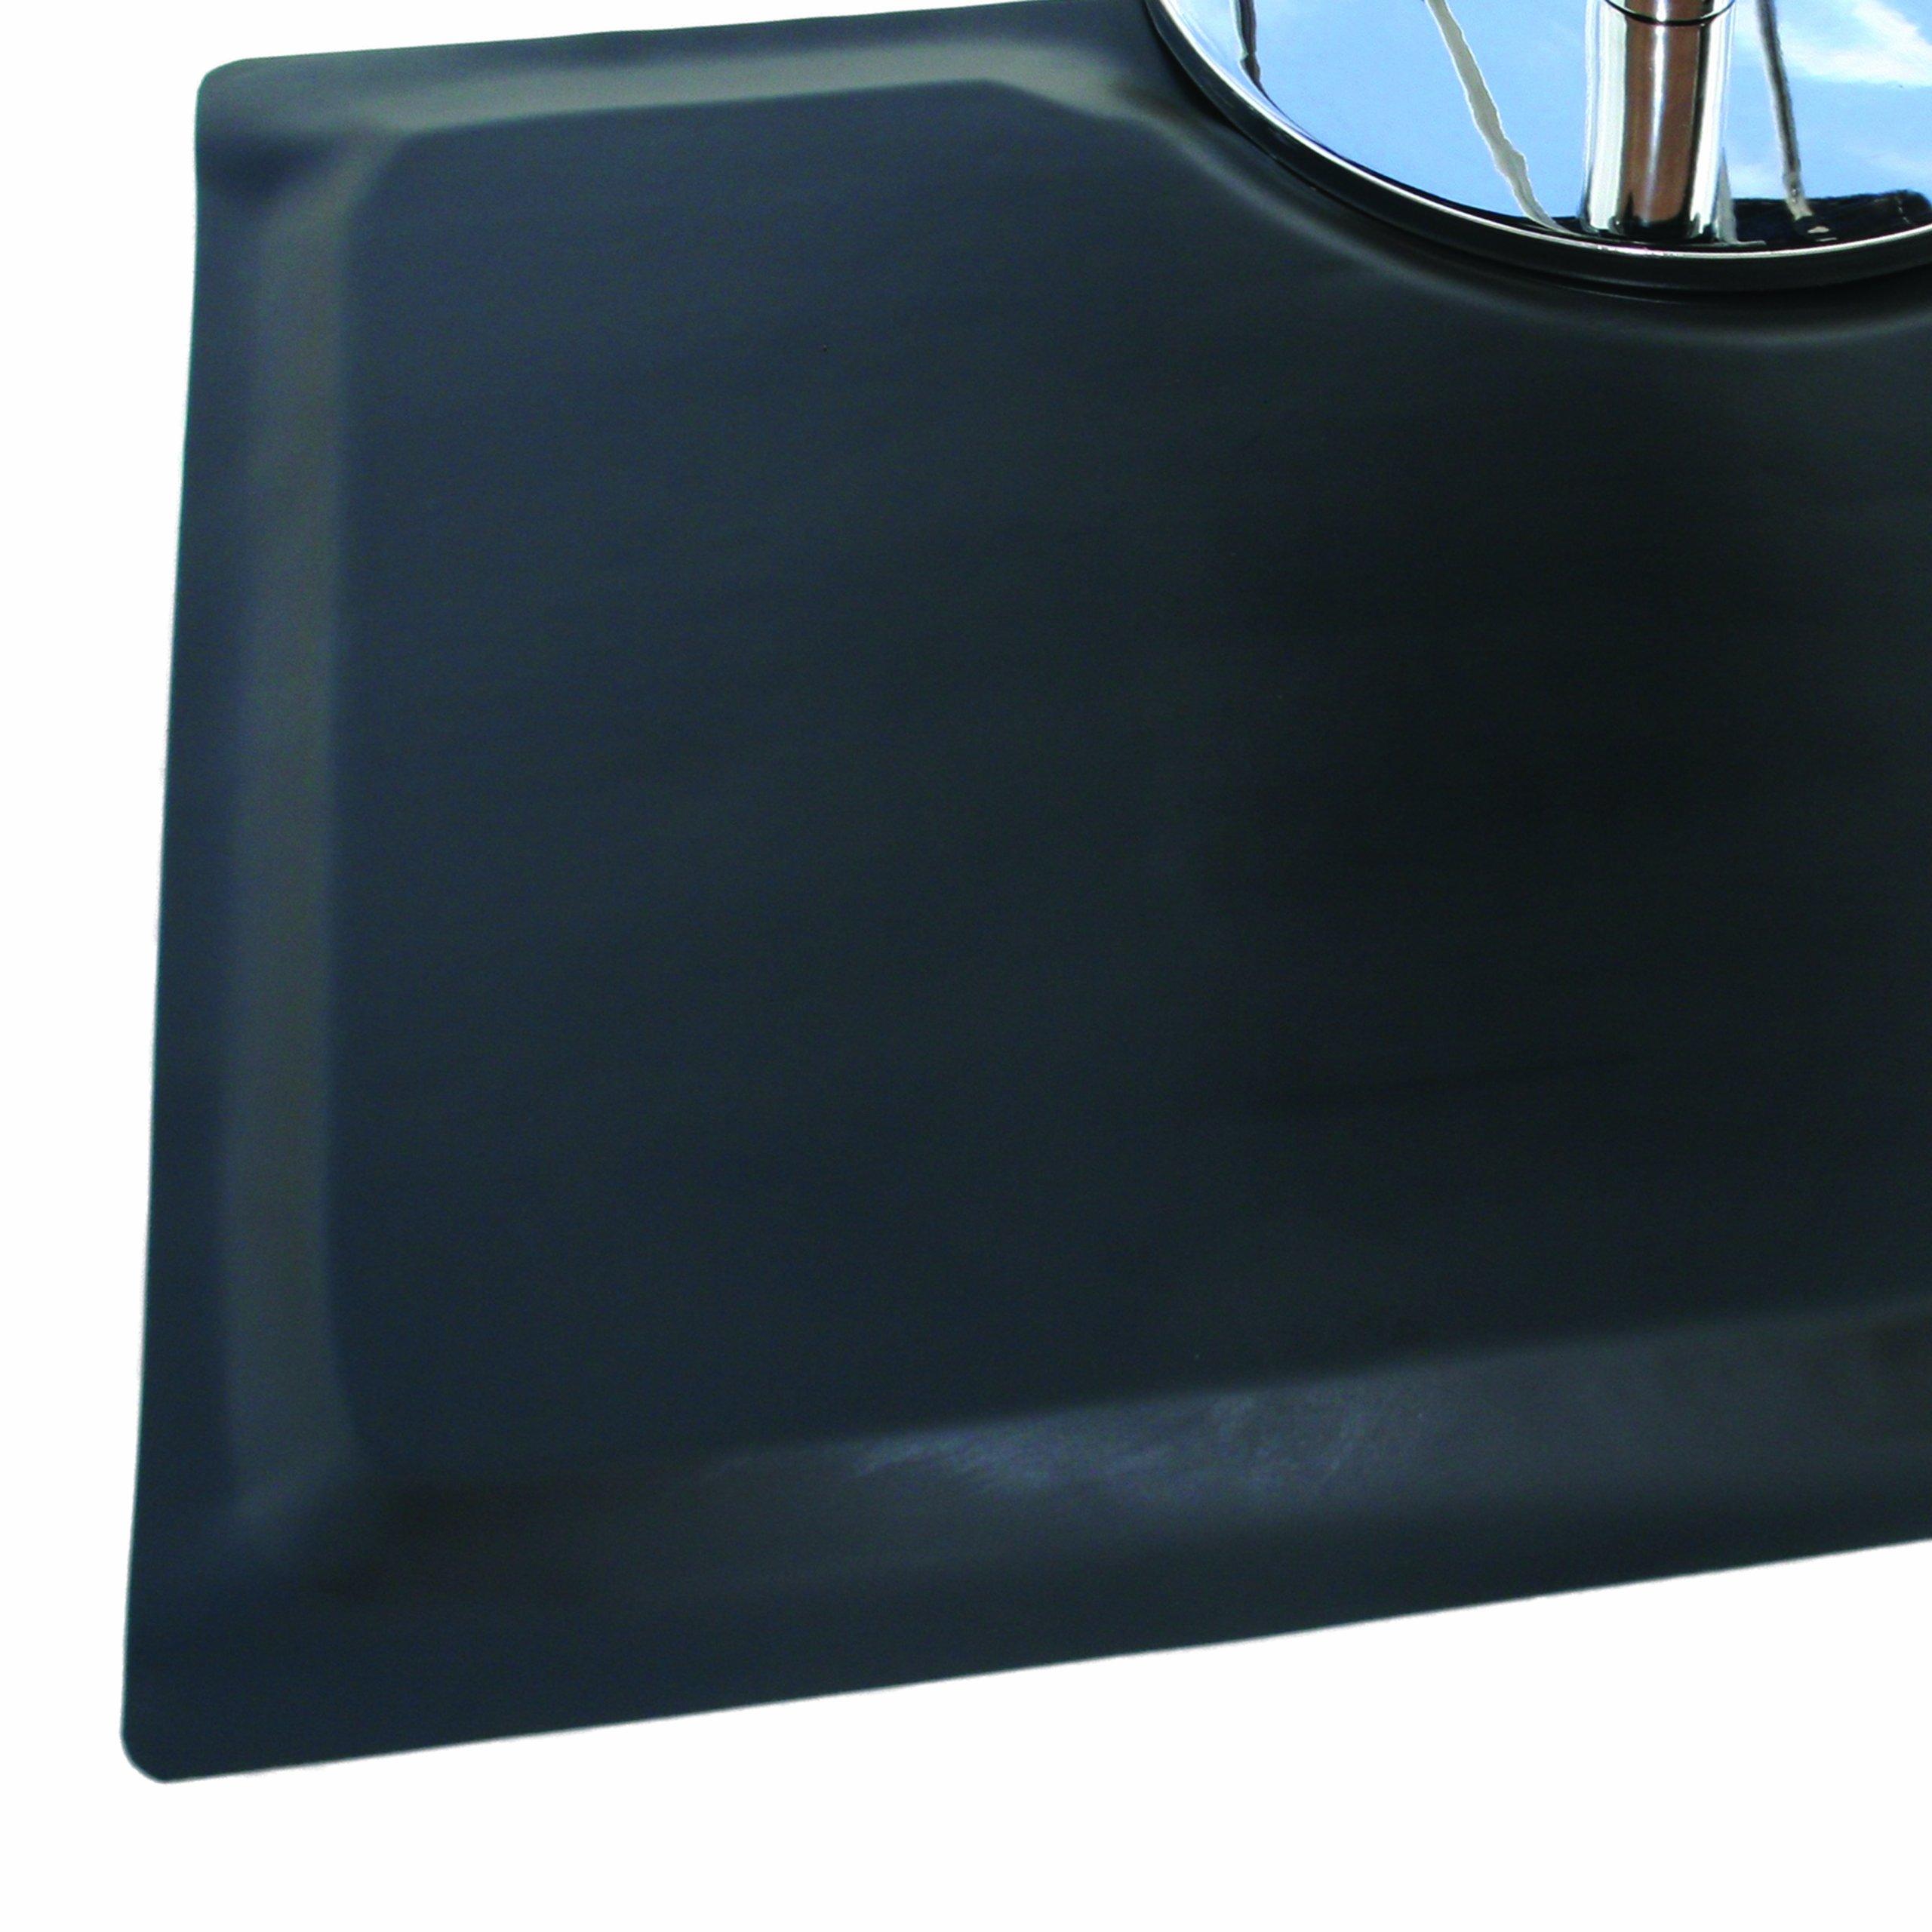 Rhino Mats XF-2436 Xtra-Flex Foam Salon Shampoo Mat, 2' Width x 3' Length x 7/8'' Thickness, Black by Rhino Mats